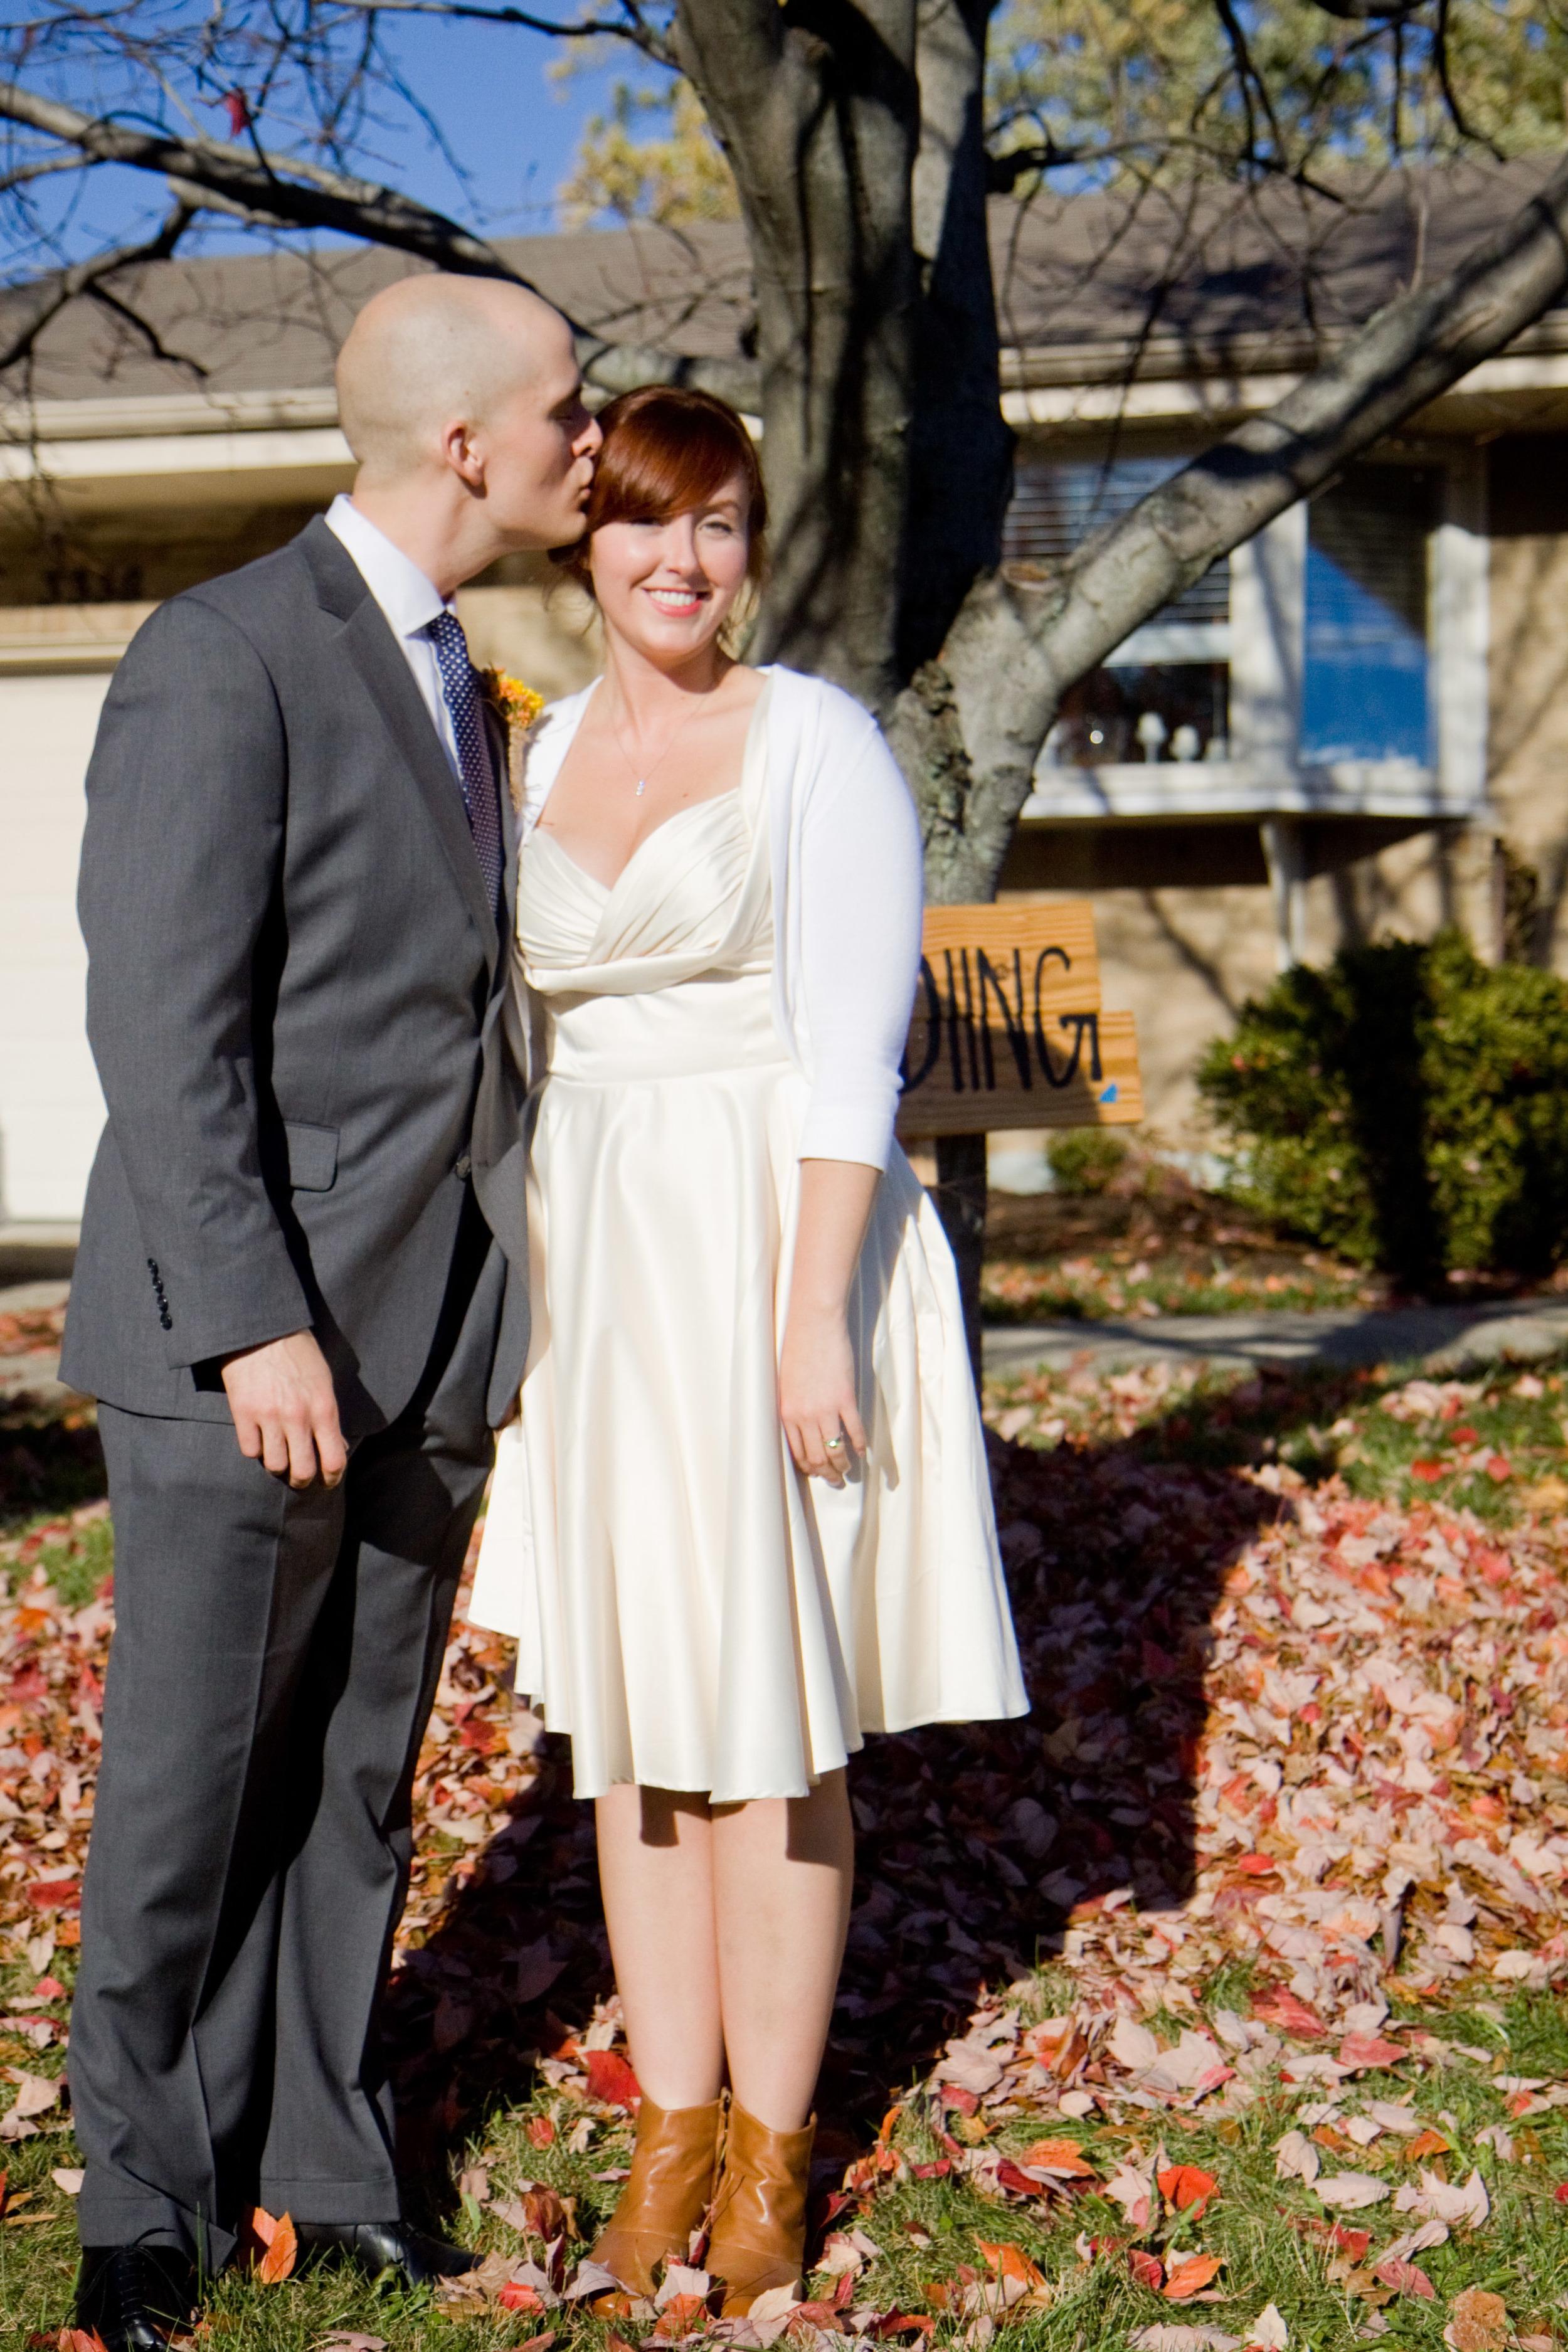 Wilson Bickel Wedding - Family Photos (25 of 25).jpg